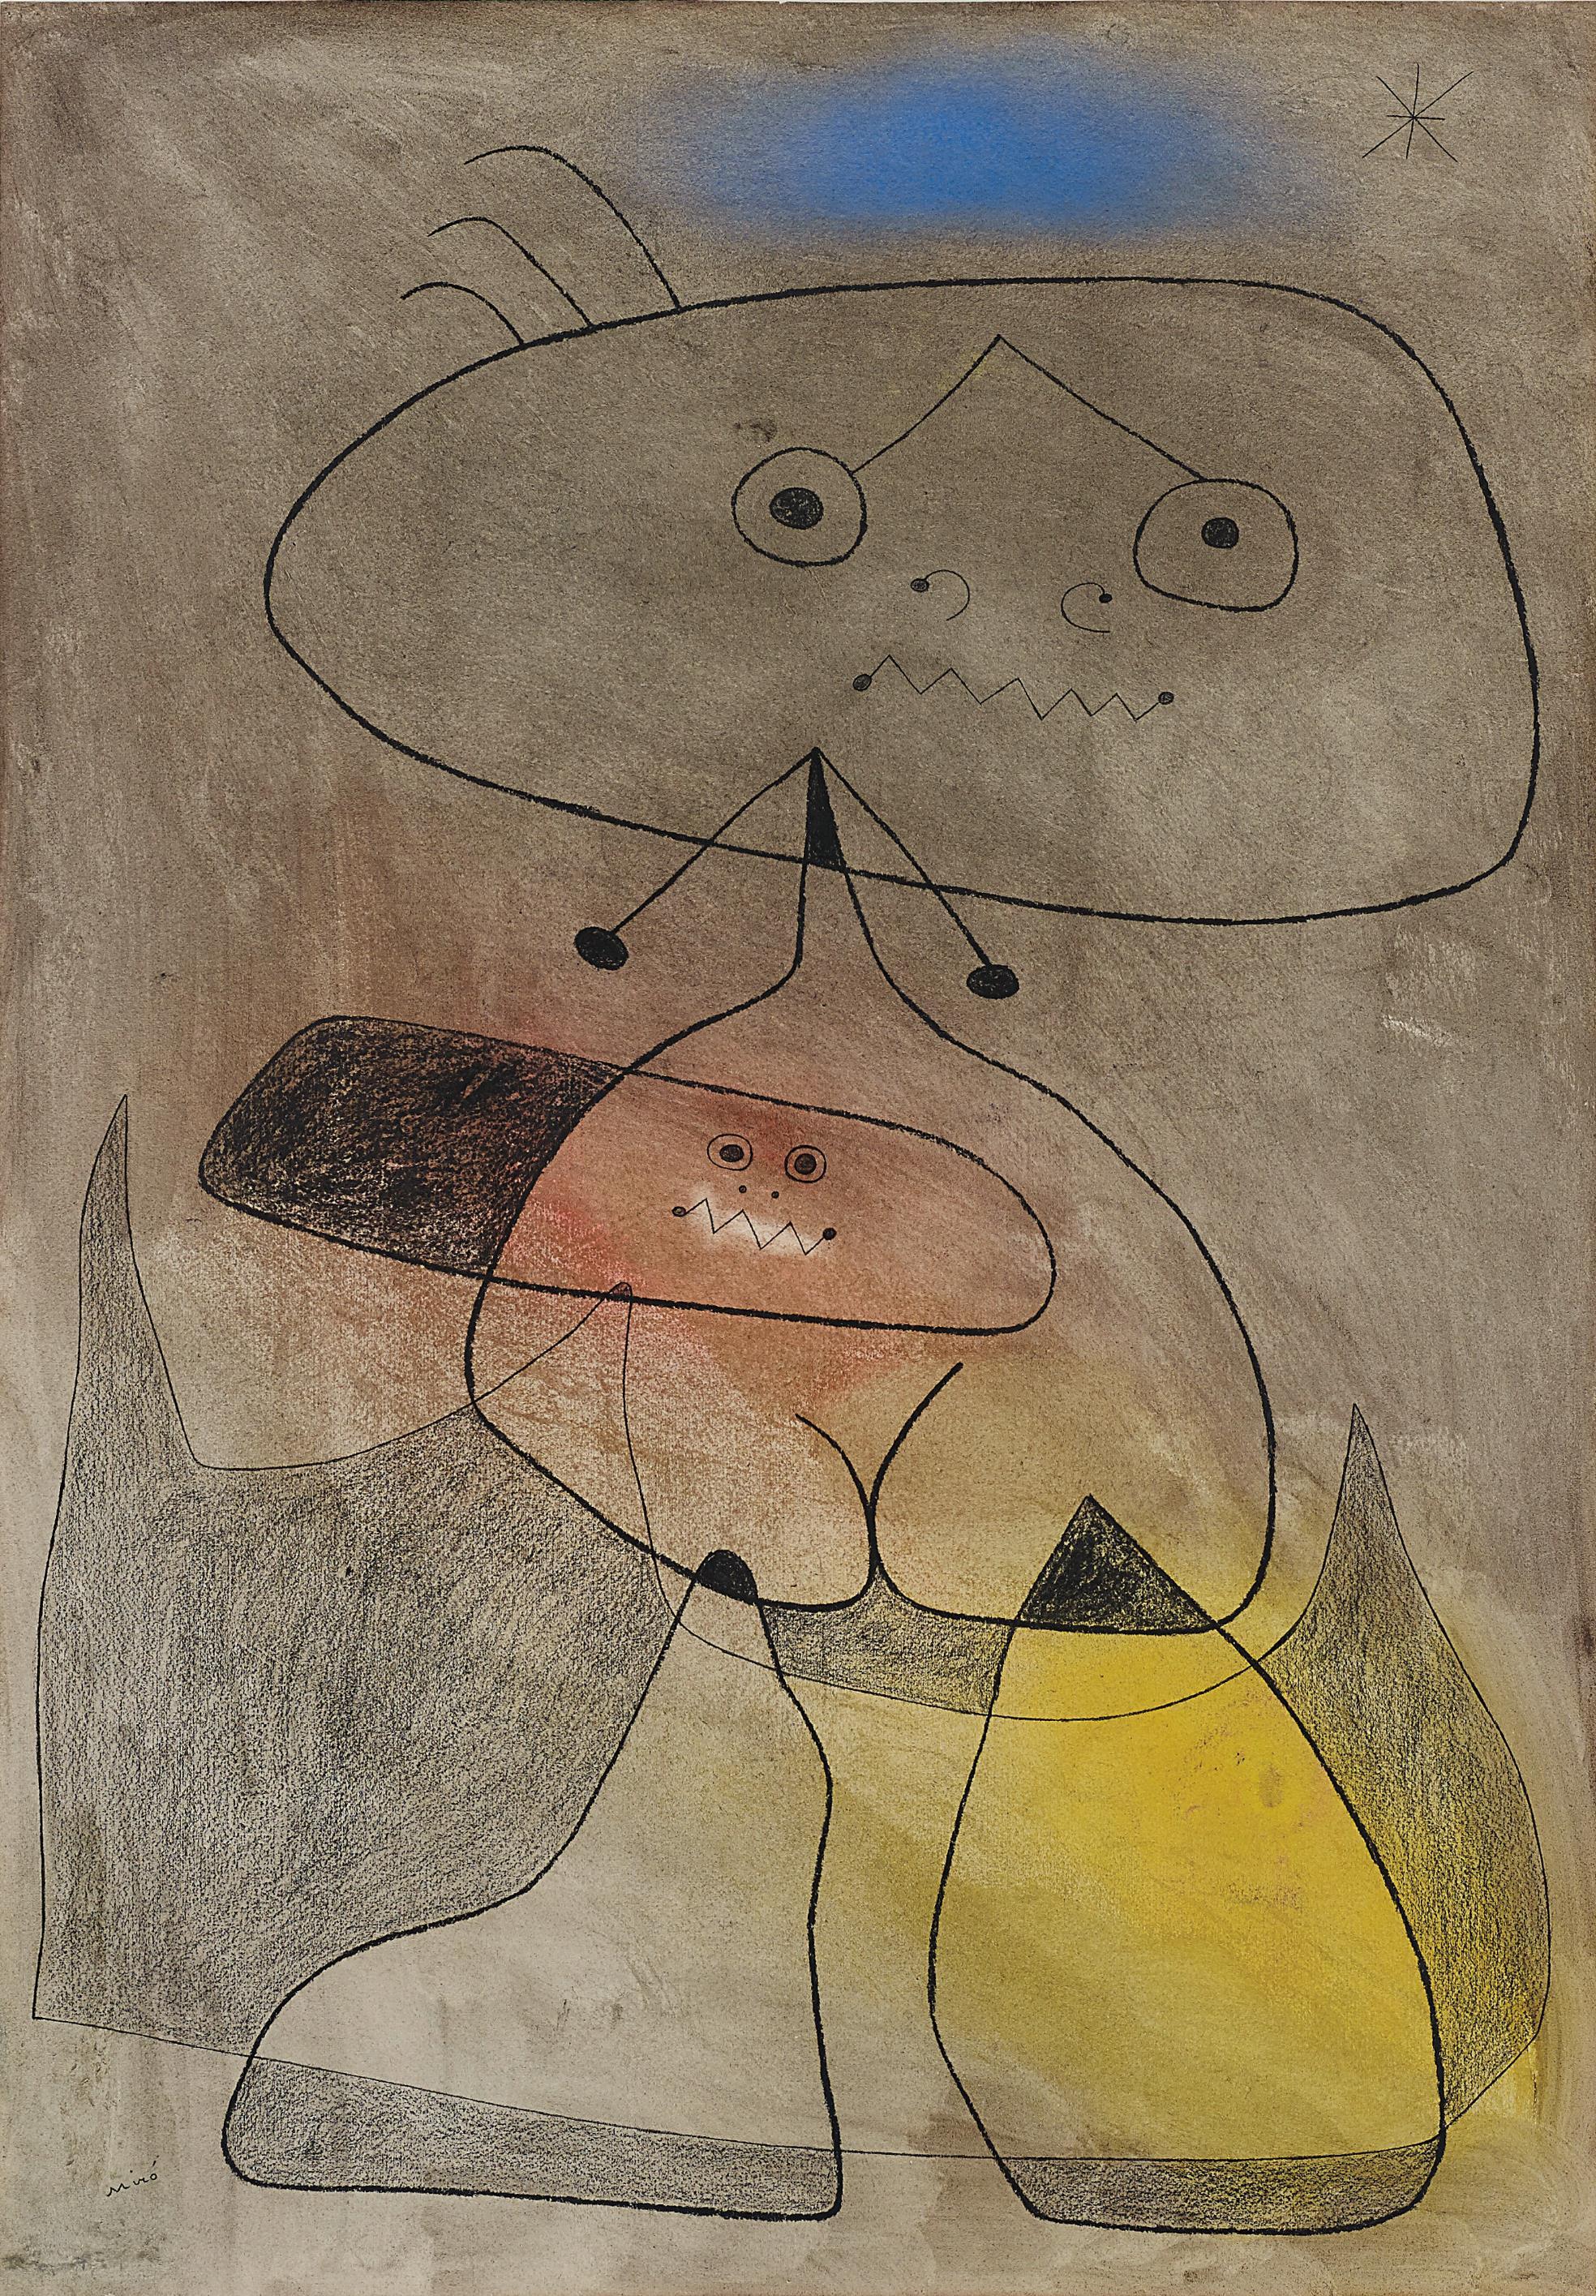 Joan Miro-Femme, Oiseau, Etoile-1943